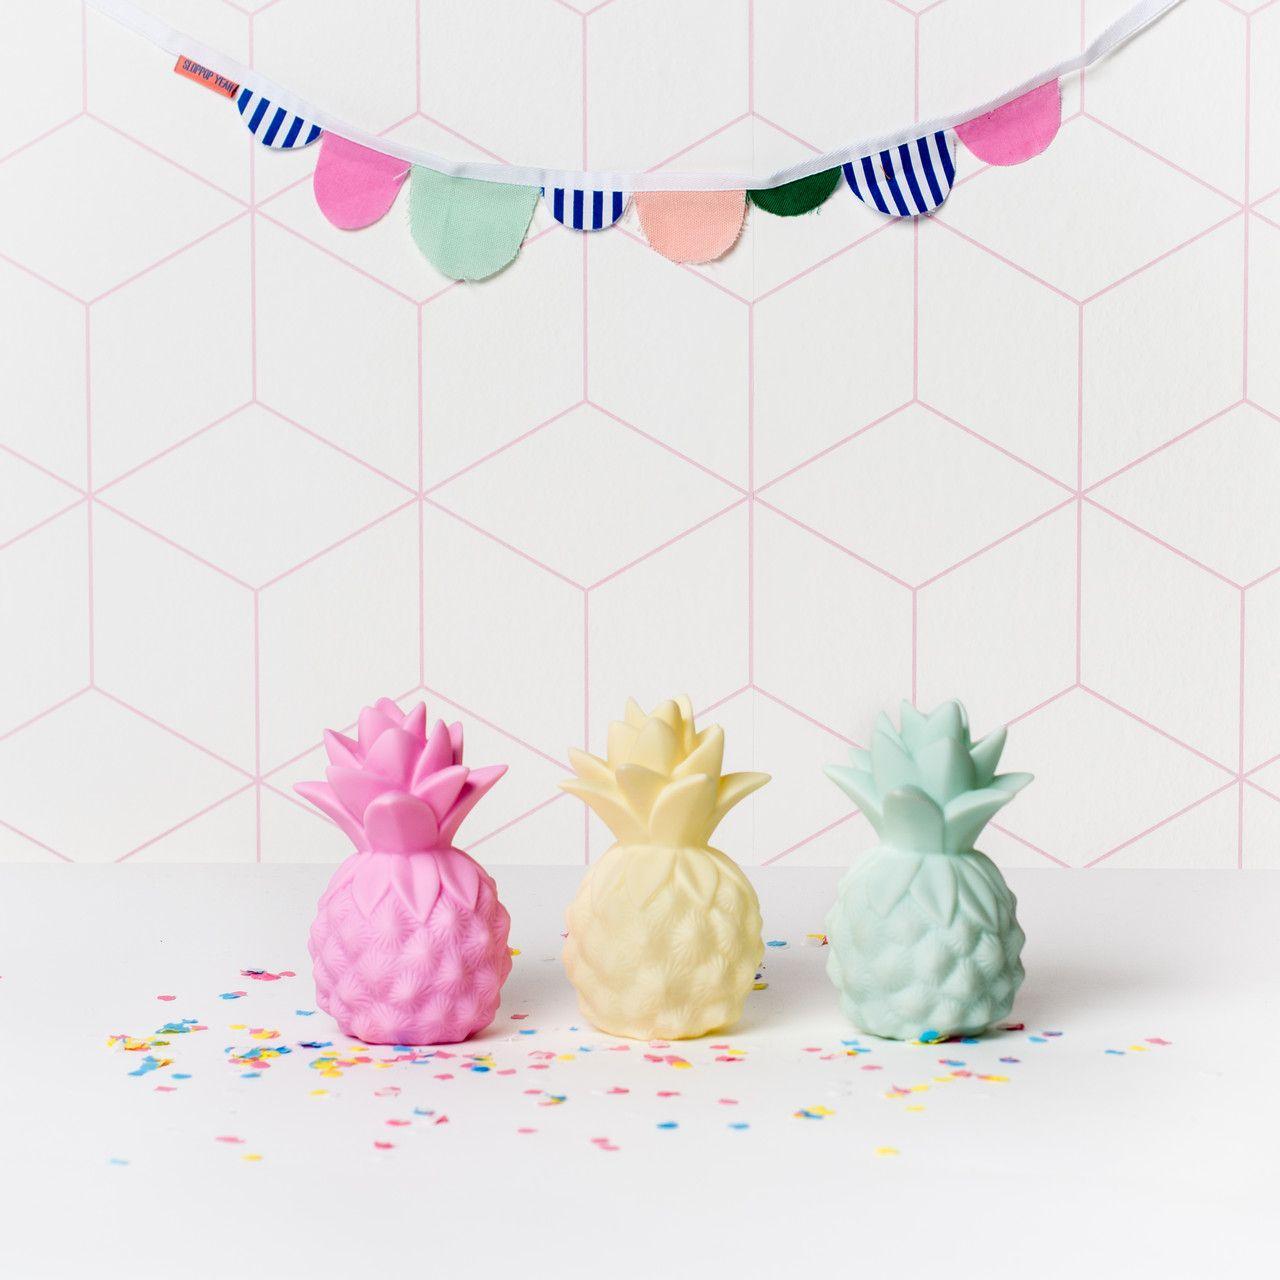 veilleuses ananas pastel pour chambre b b et enfant eef lillemore pastel pineapple night. Black Bedroom Furniture Sets. Home Design Ideas